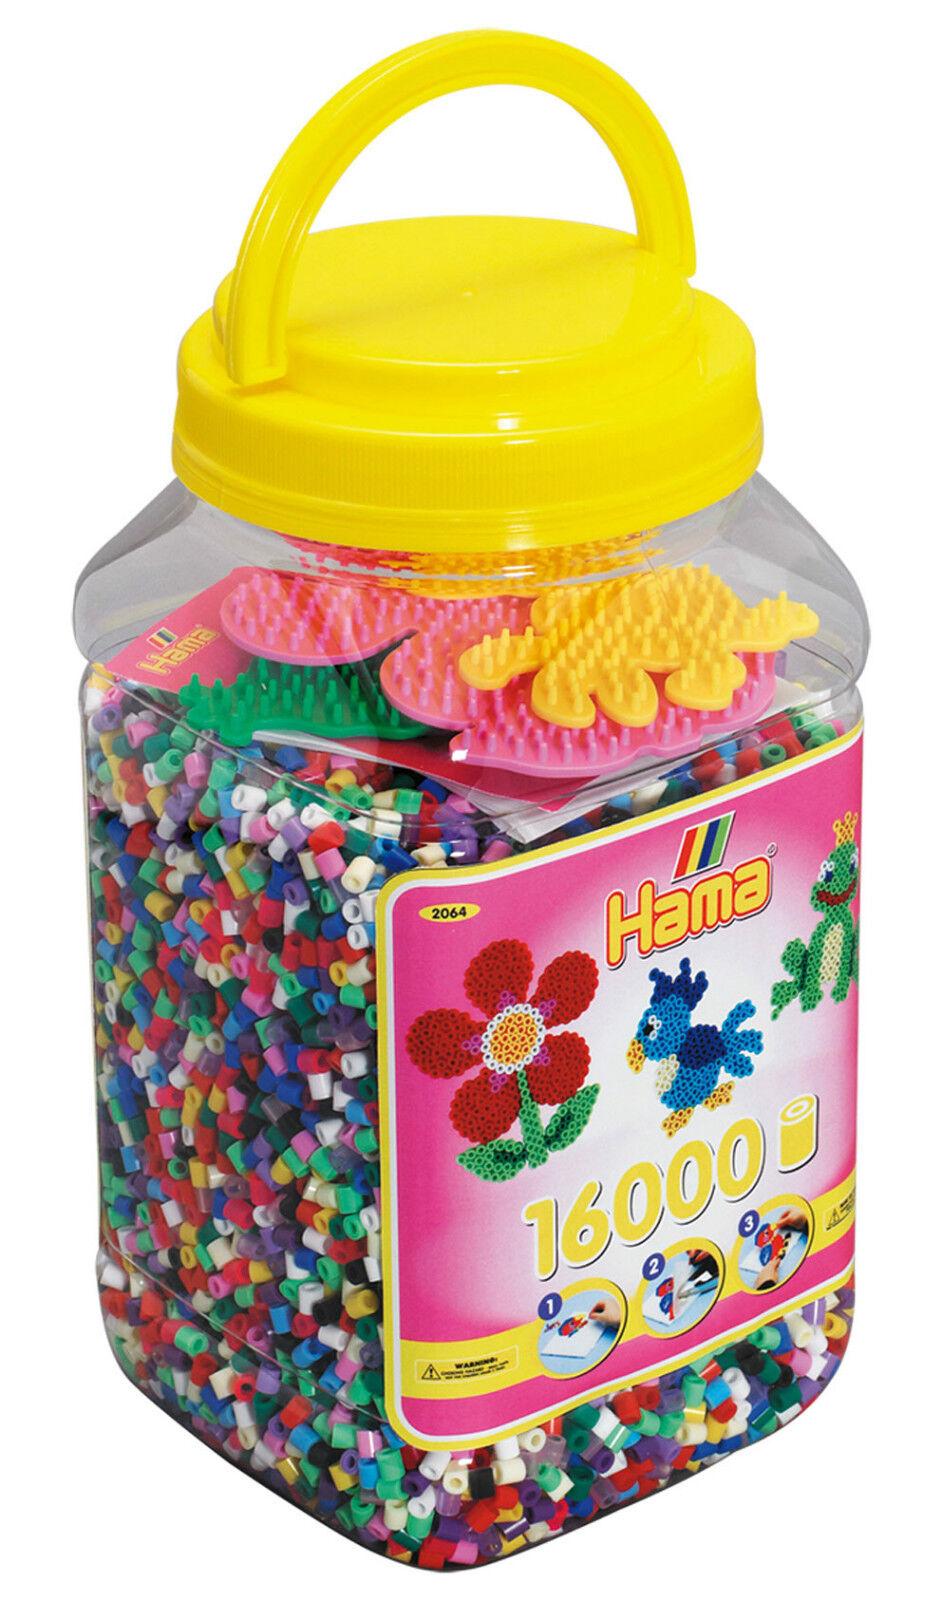 Hama Beads Pegboards Tub Craft (Yellow) 16,000 - NEW